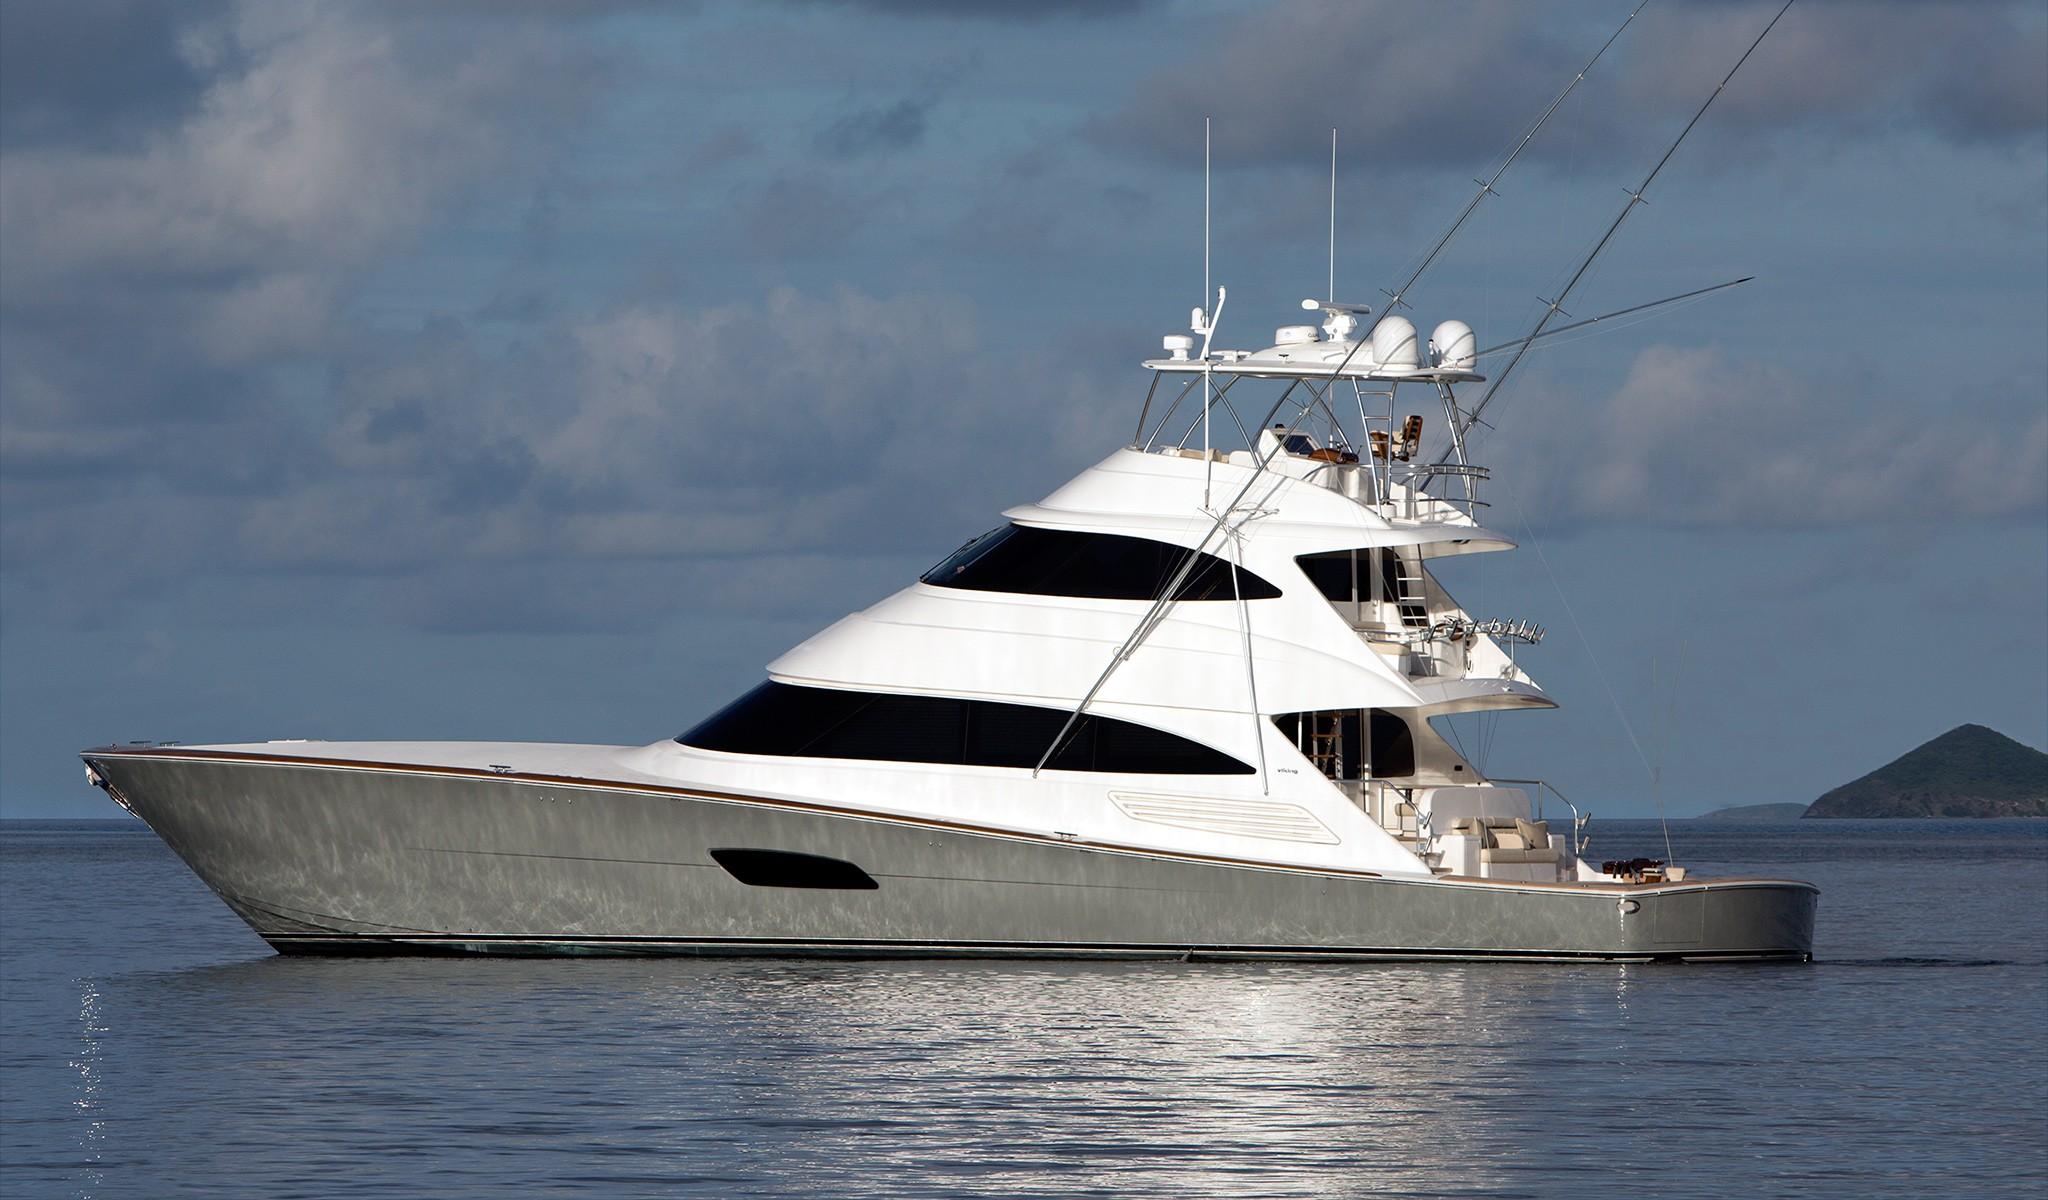 Best yacht and superyacht brands, top superyacht shipyards